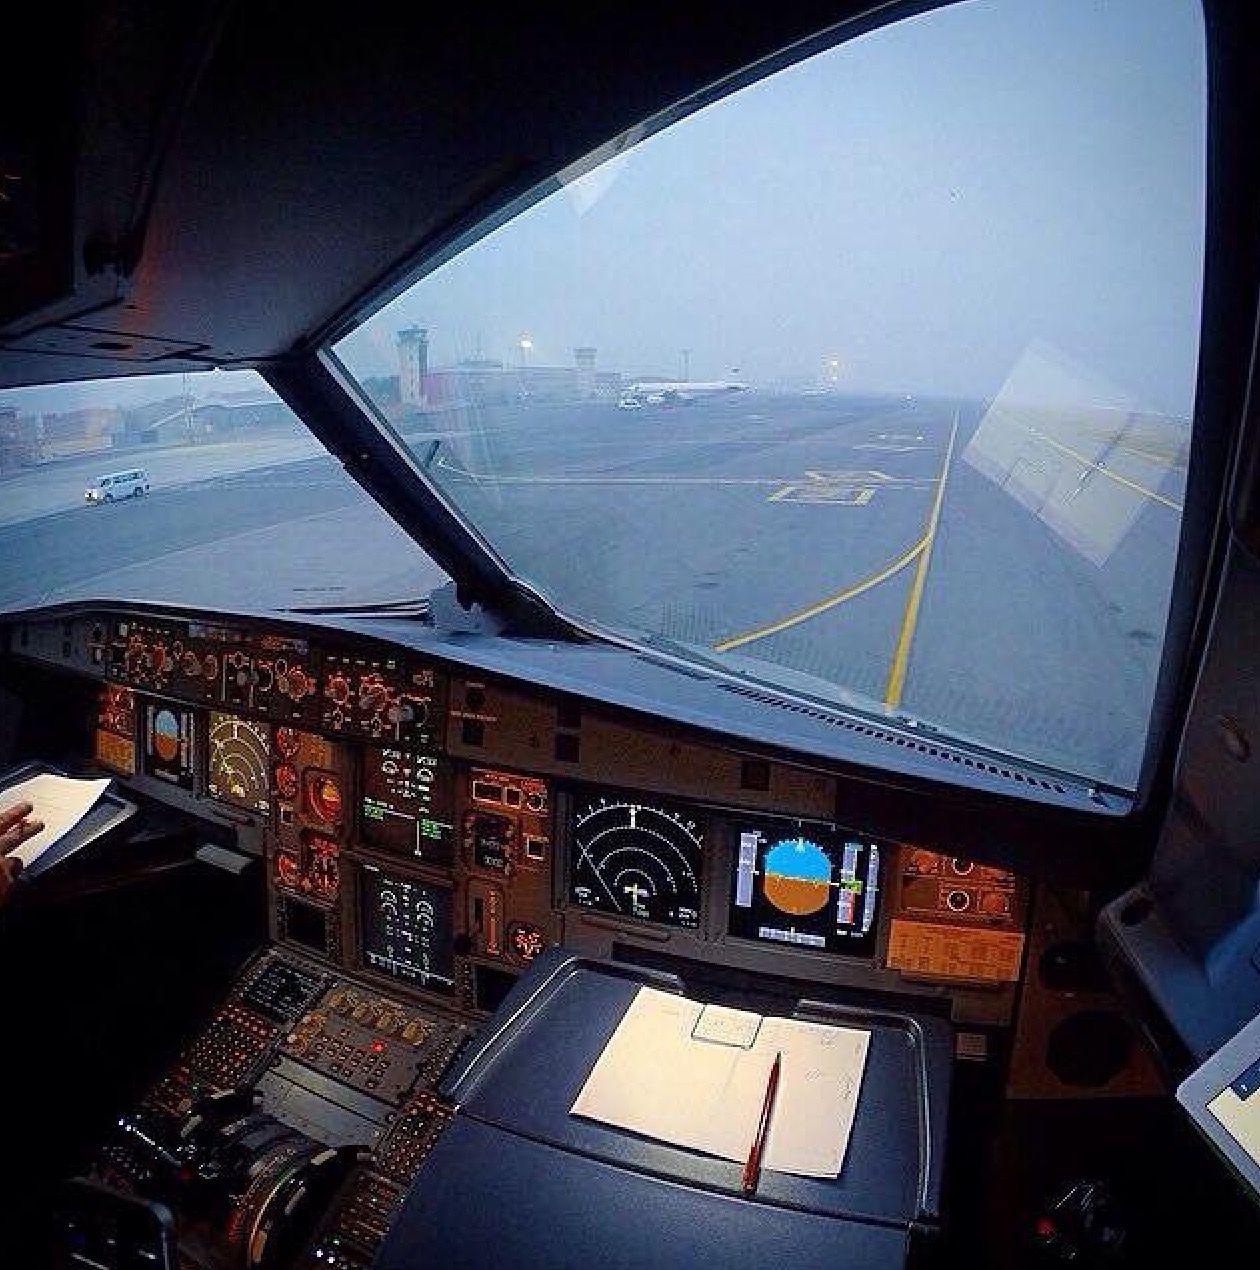 Pin De Oswaldo Barriga En Aviación Airplane Aviation Y